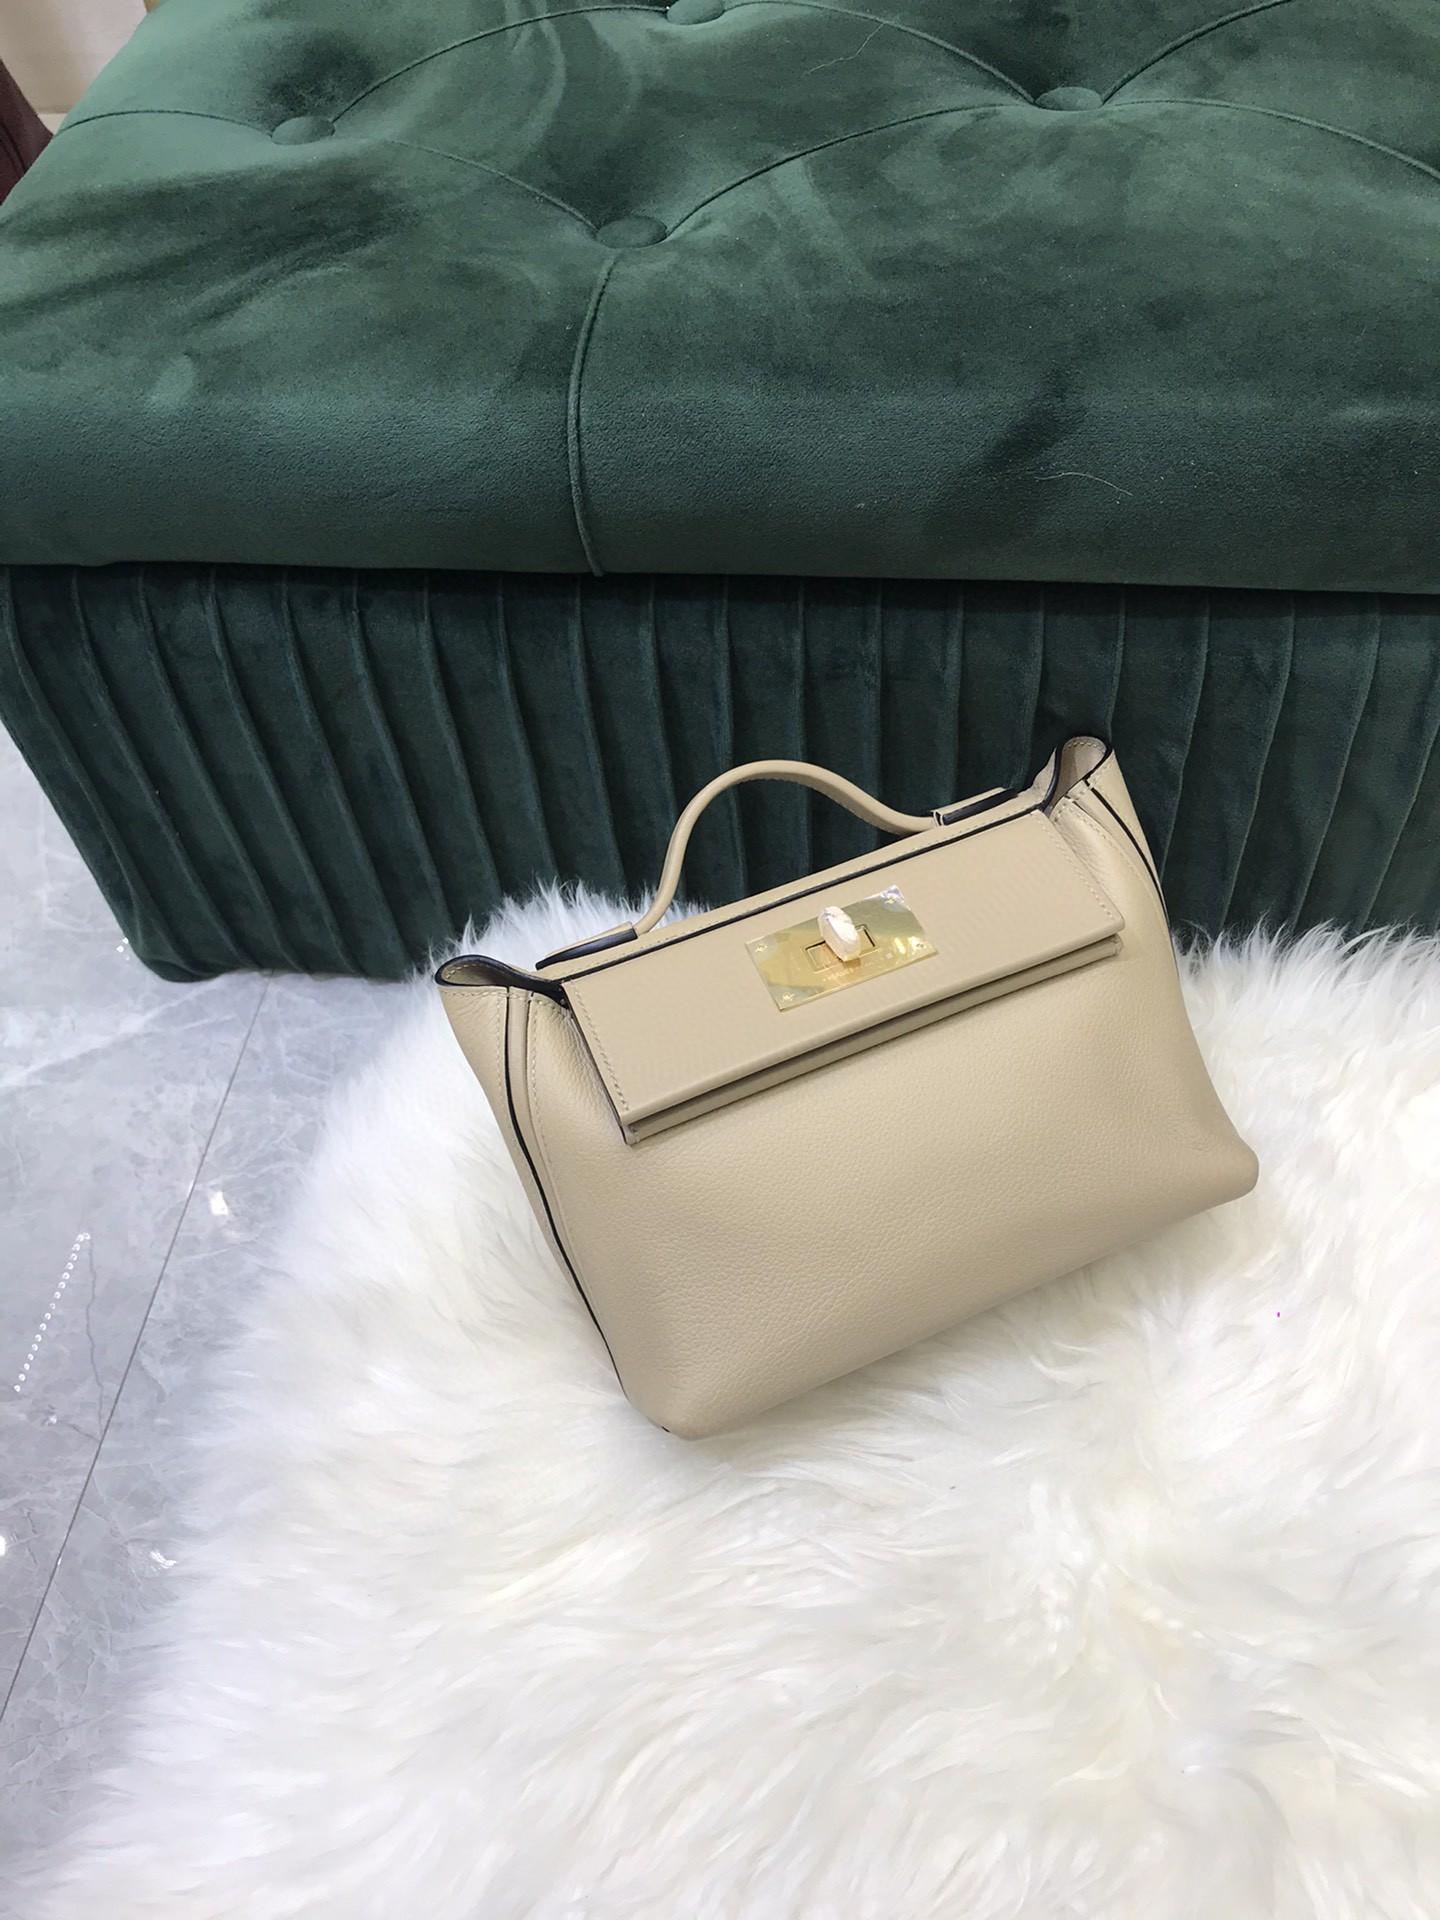 Toppe Fully Handmade LUXURY PURSE,21cm mini 2424 bag,Brand Handbag,Evercolor with swift Leather, Shoulder...